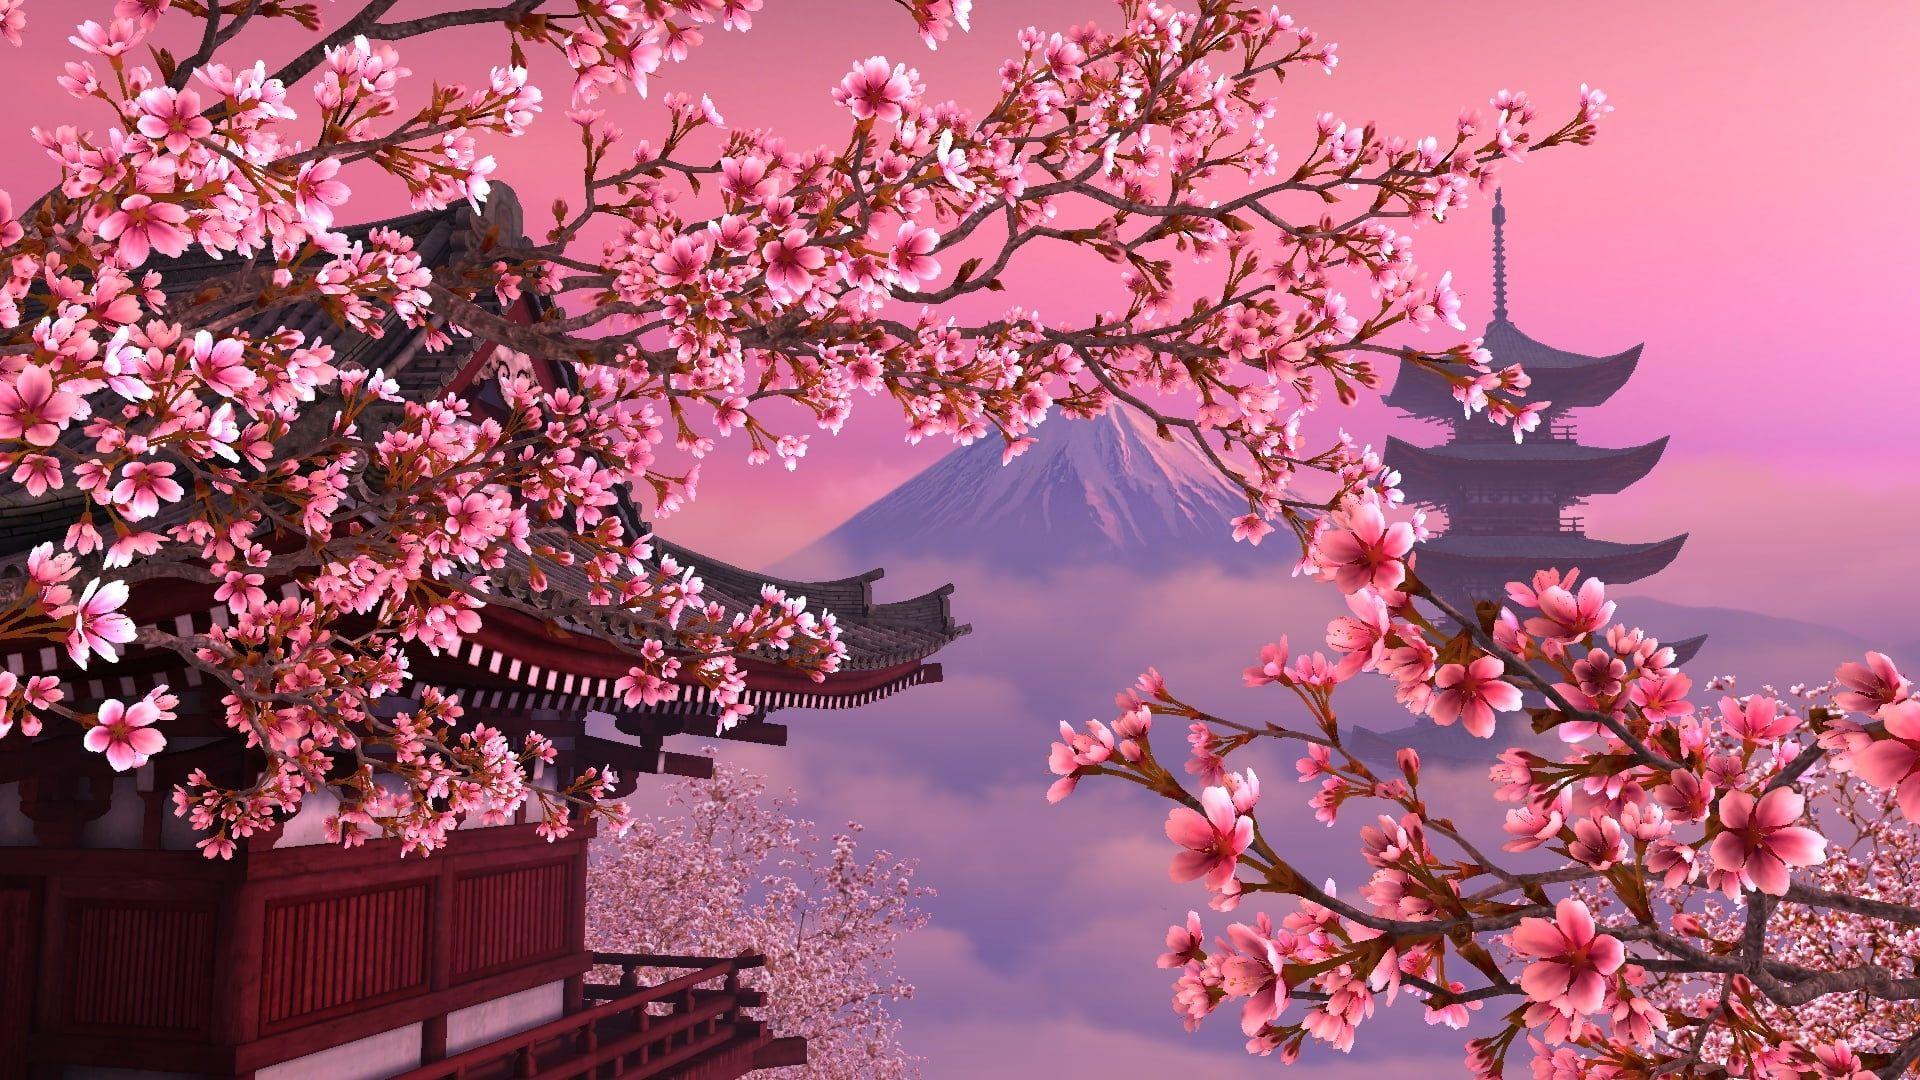 Mount Fuji Japan Animated Wallpaper Japan Sakura Pink Beautiful 1080p Wallpaper Hdwallpape Cherry Blossom Wallpaper Landscape Wallpaper Japan Landscape